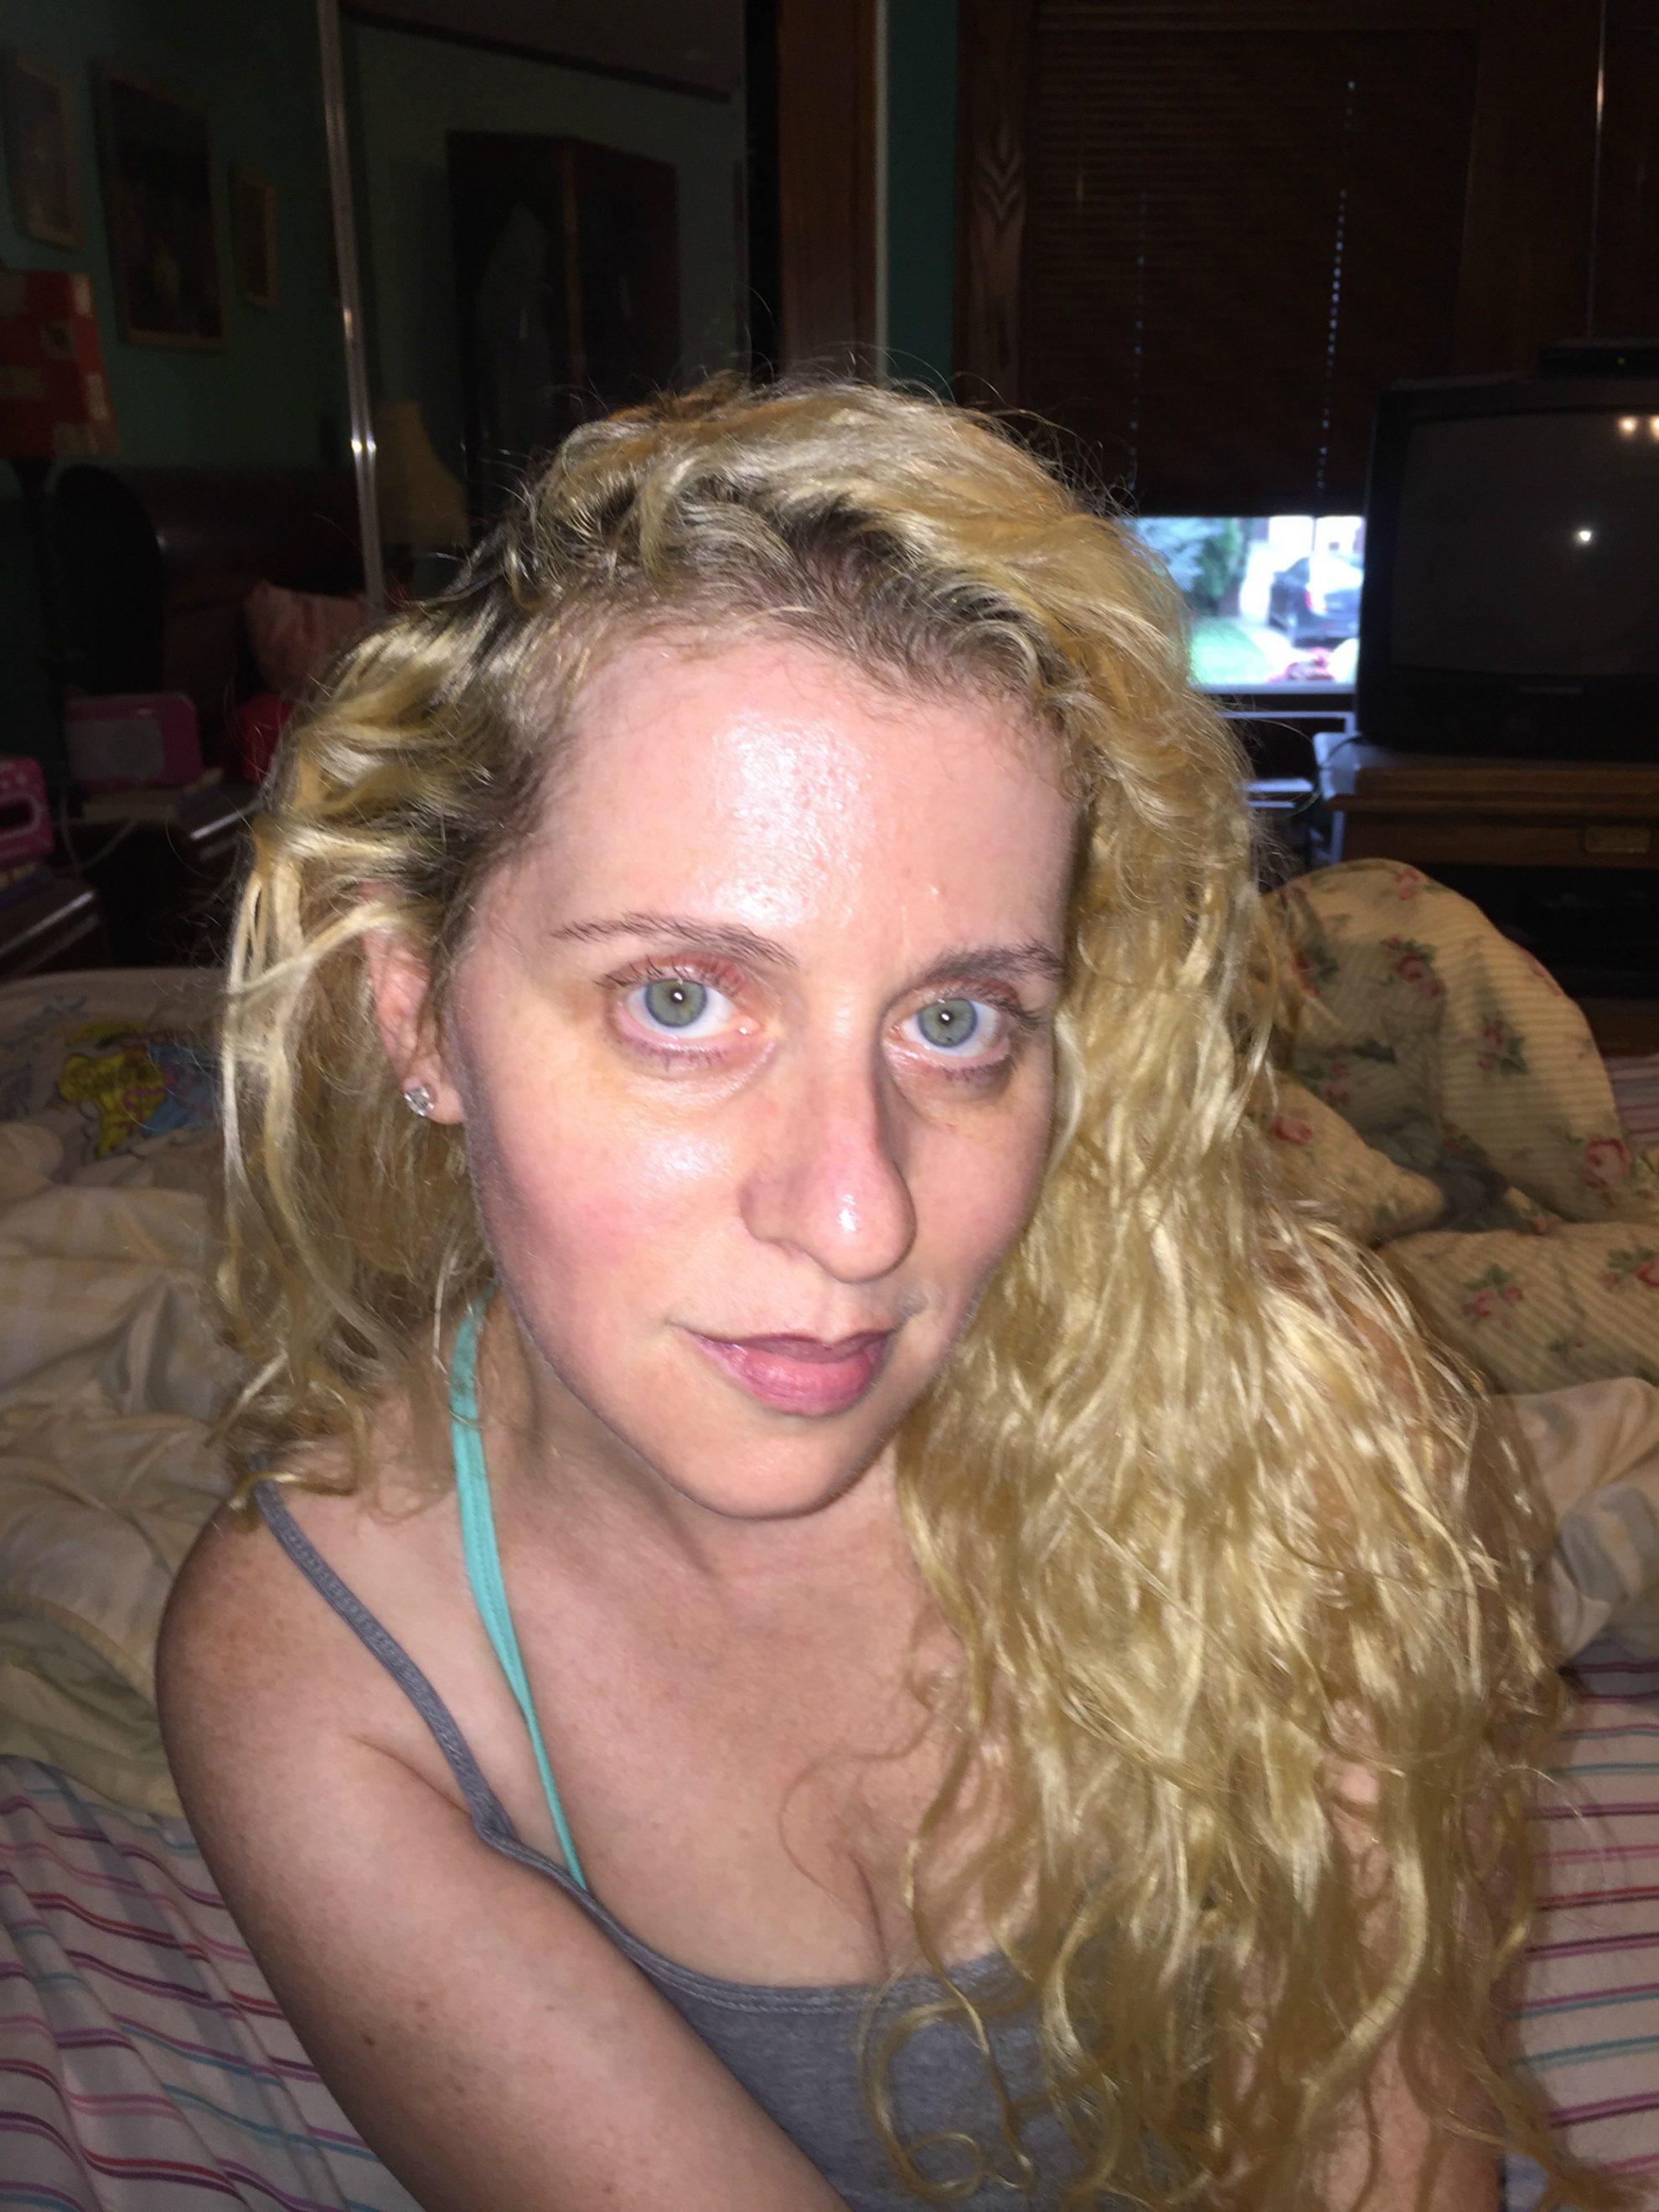 Day five of my Neutrogena Rapid Wrinkle Repair photo diary